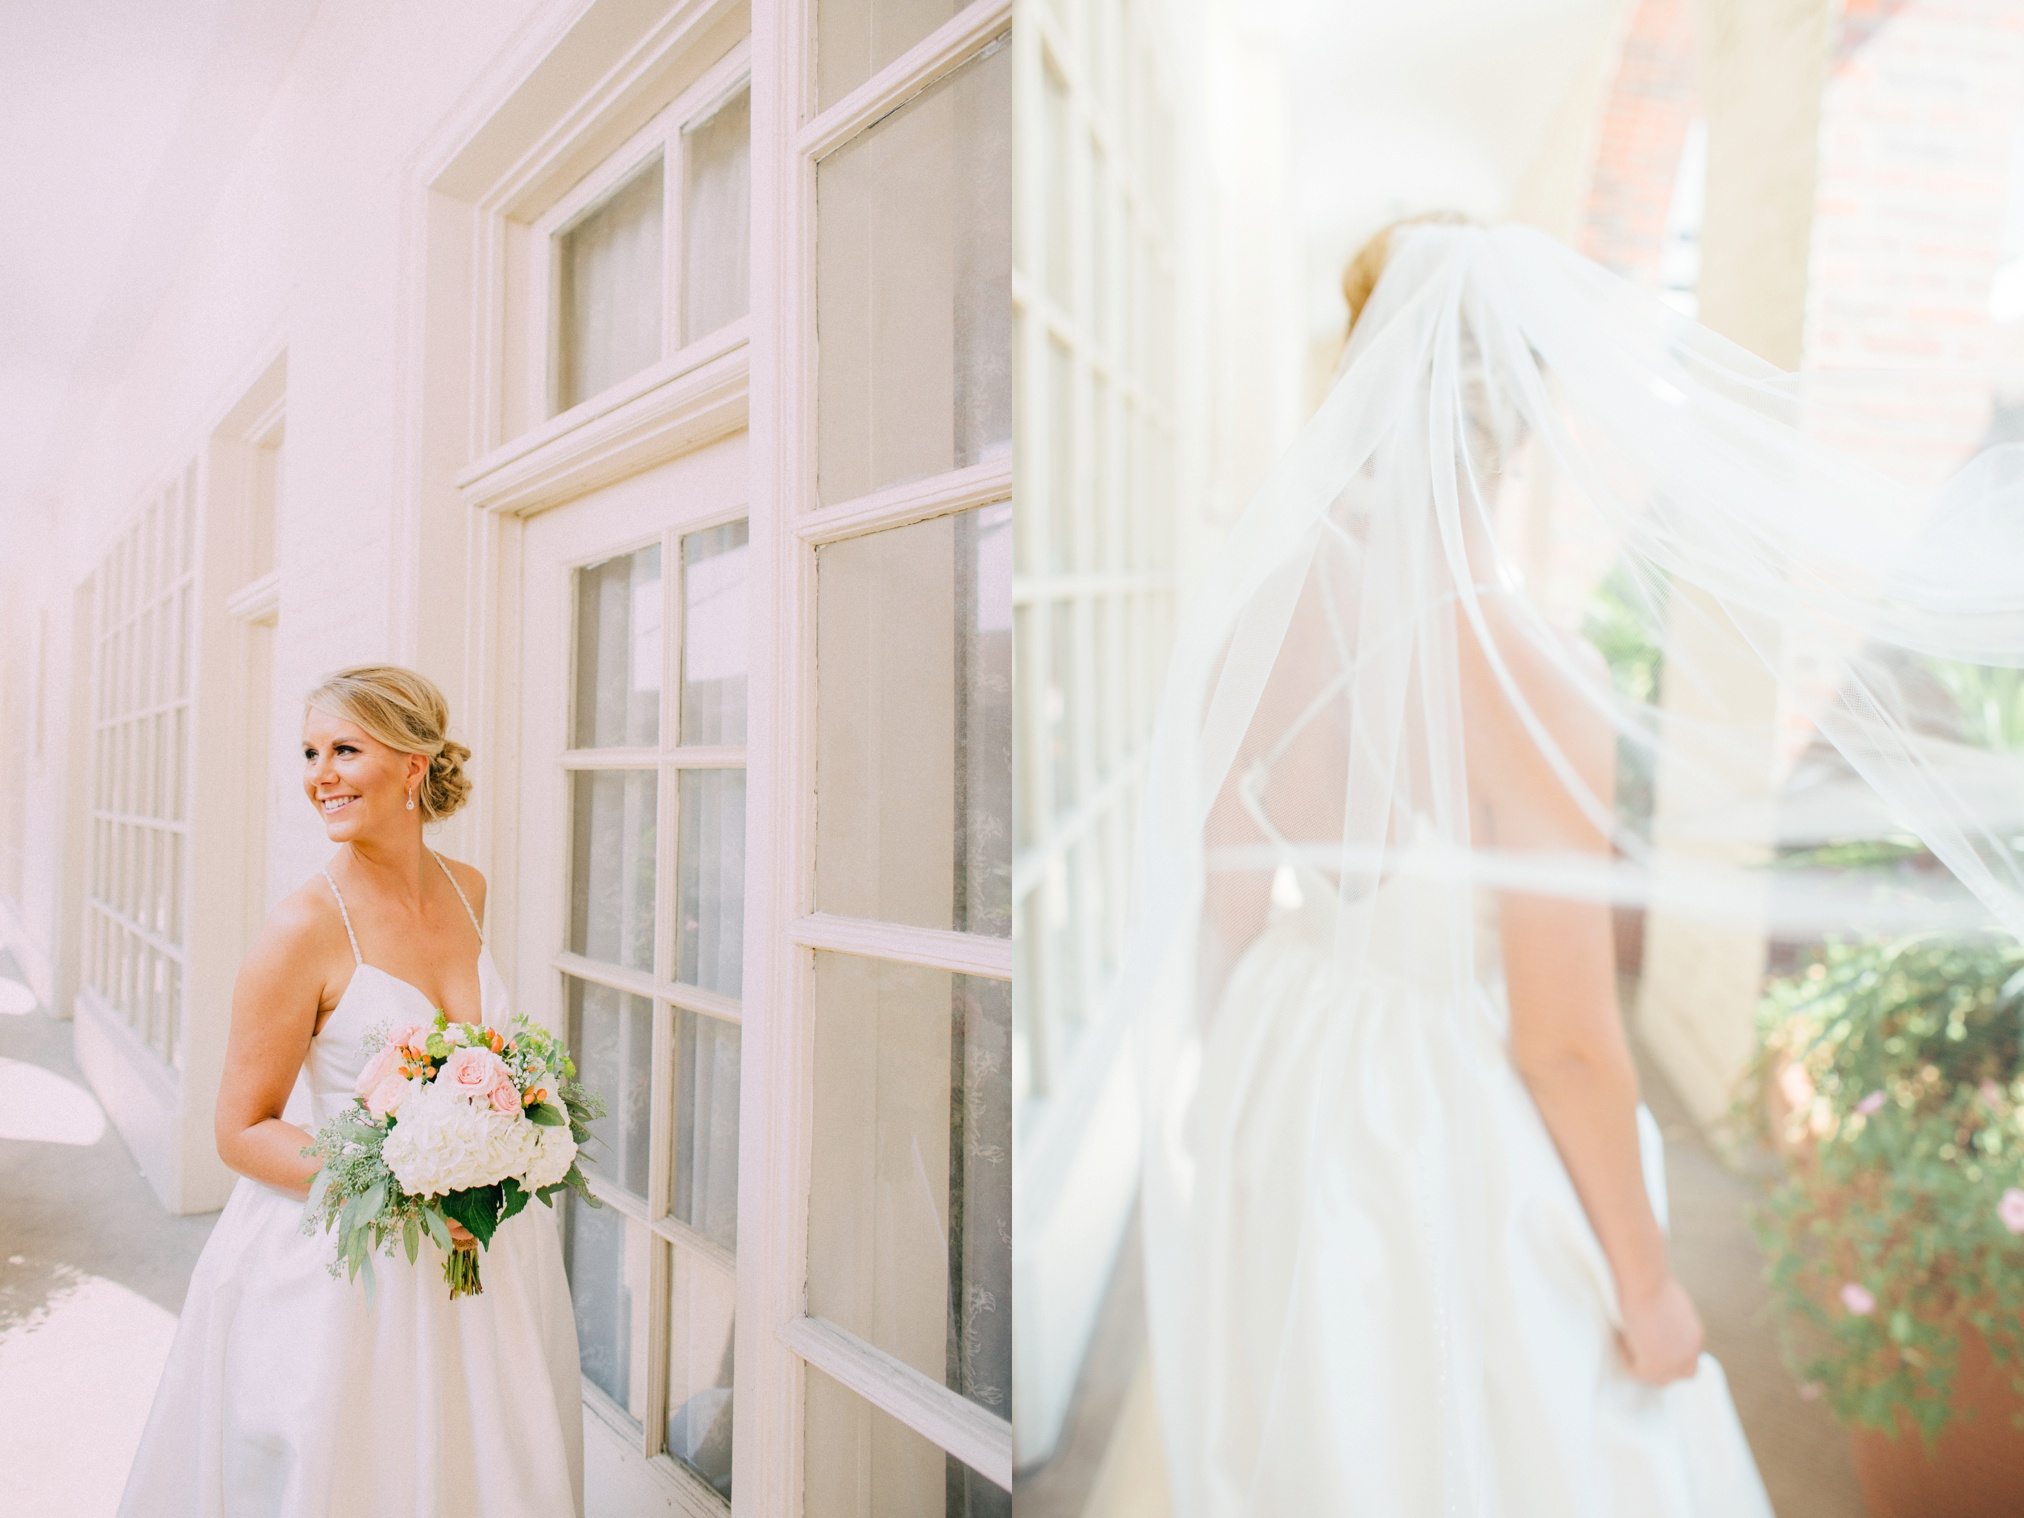 brenna+michael_wedding-226.jpg